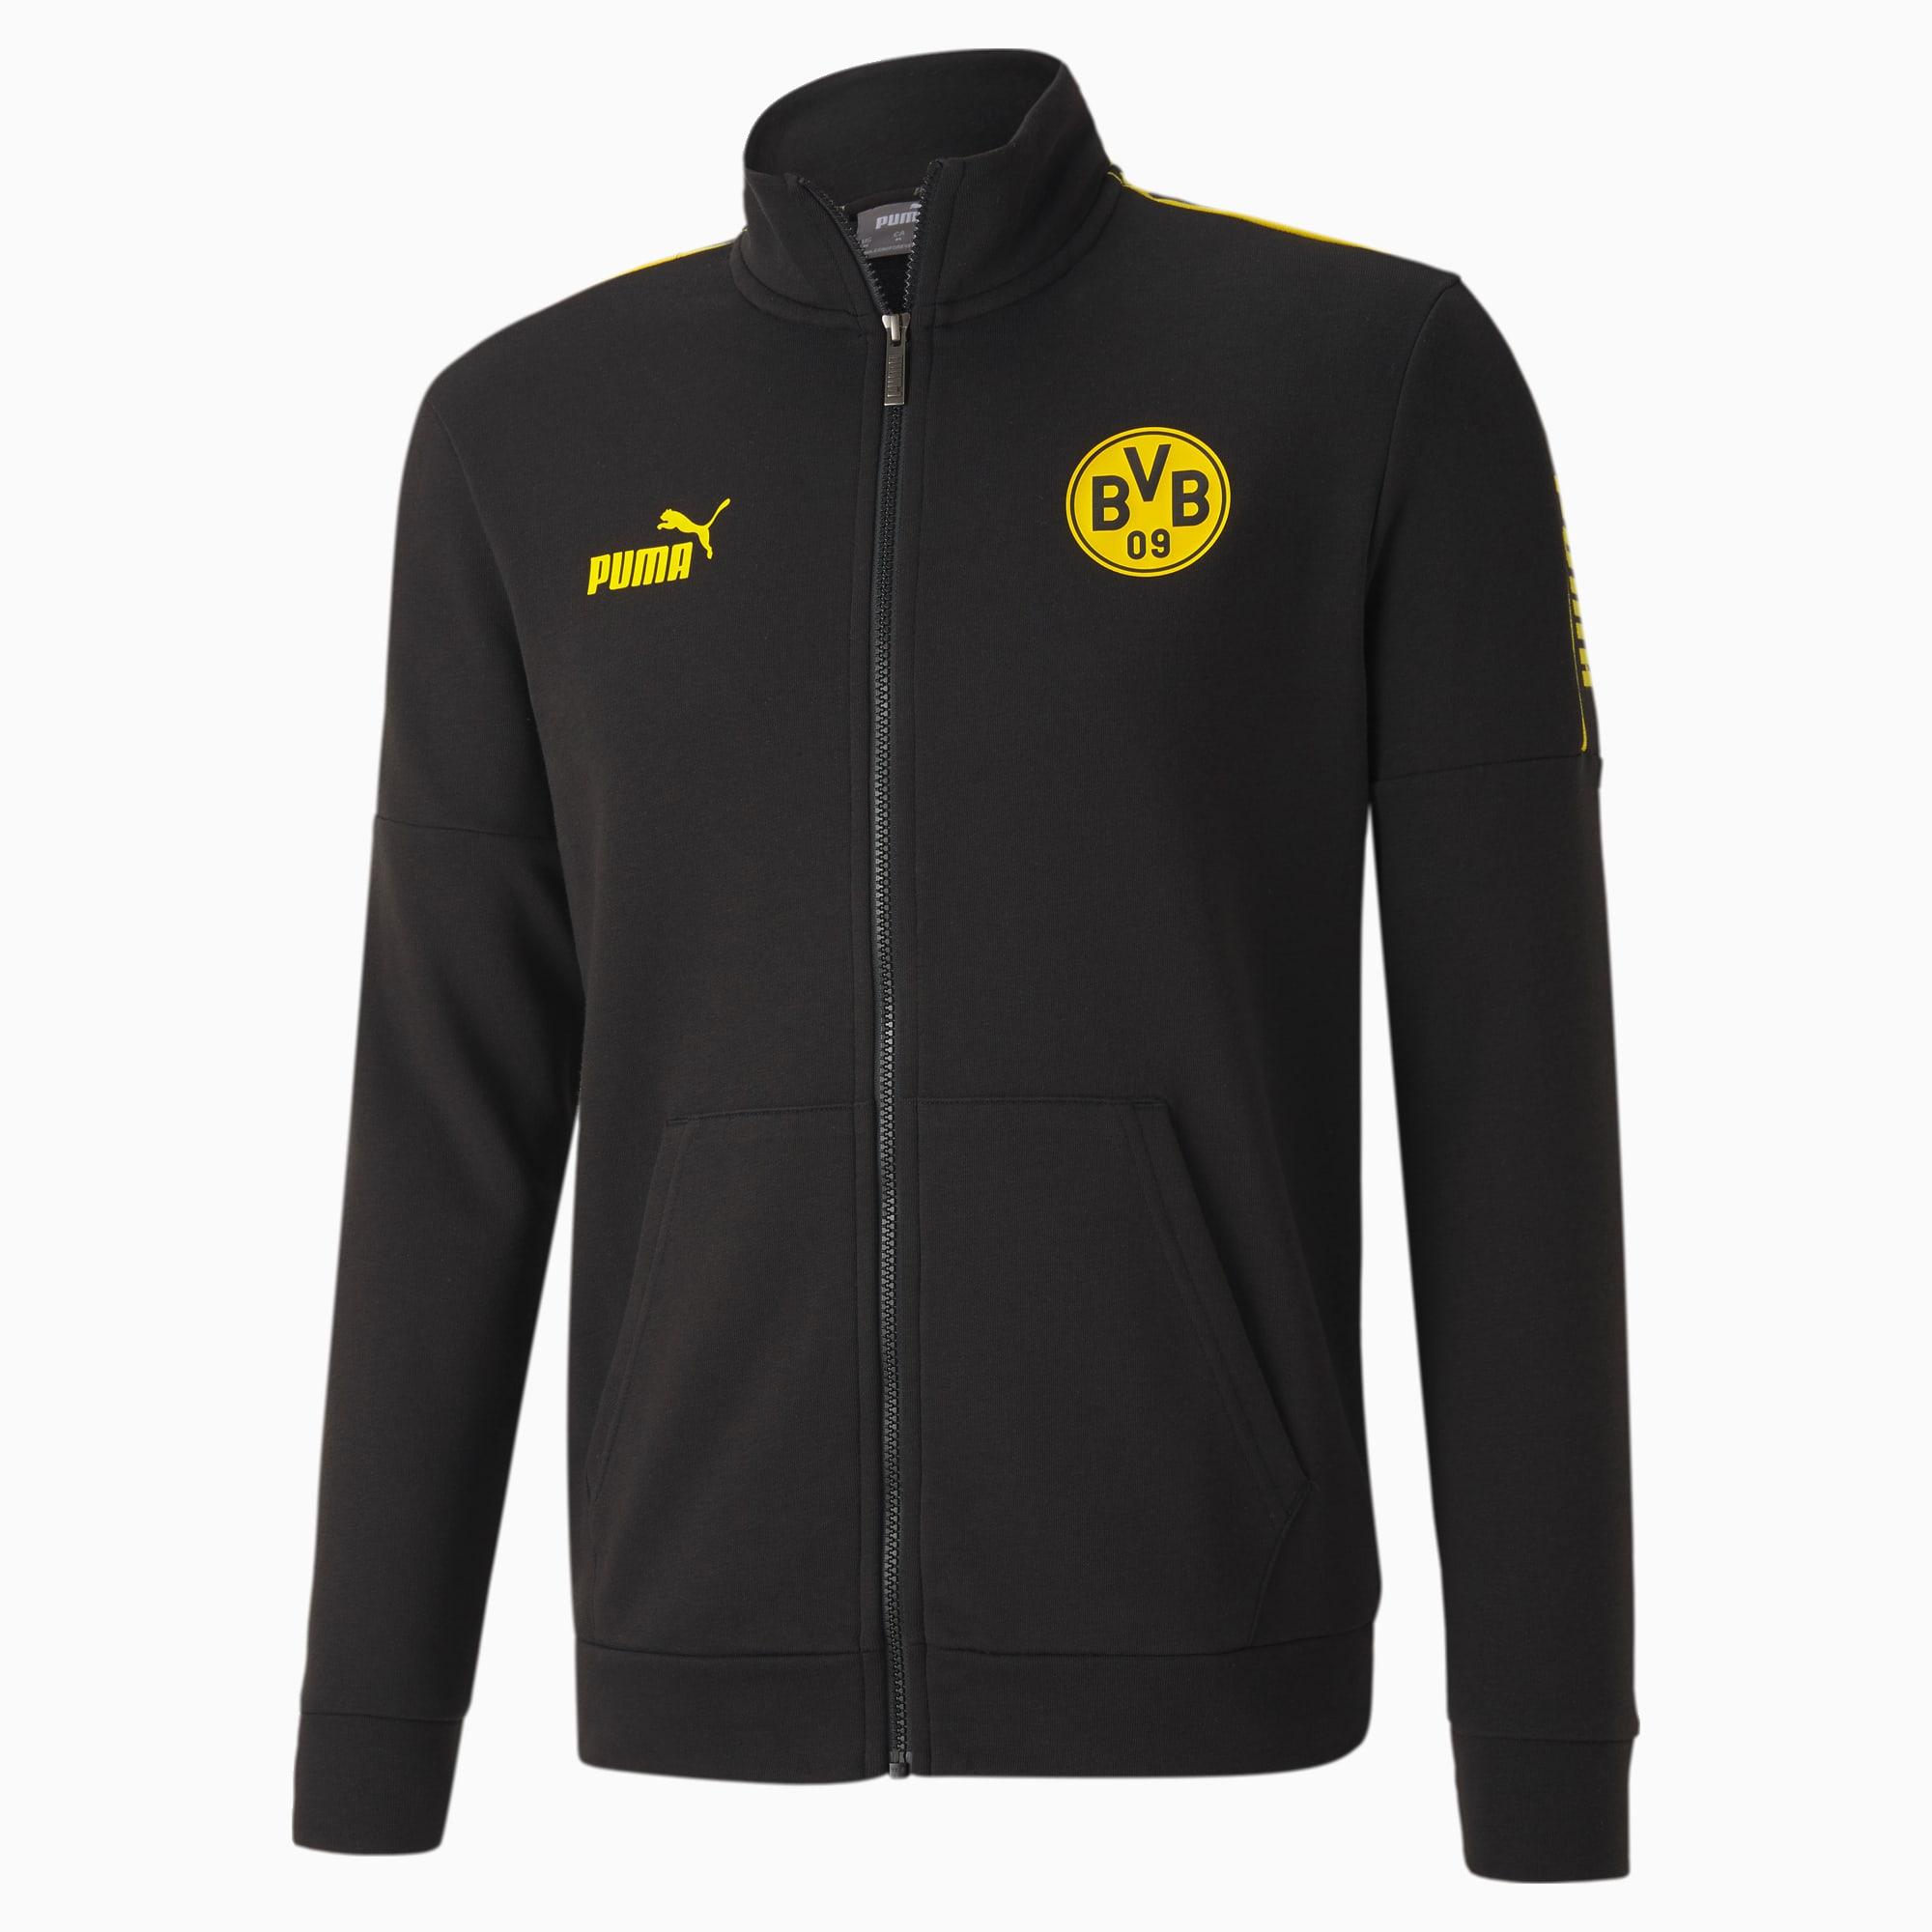 puma -  BVB ftblCULTURE Fußball Trainingsjacke | Mit Aucun | Schwarz/Gelb | Größe: XXL